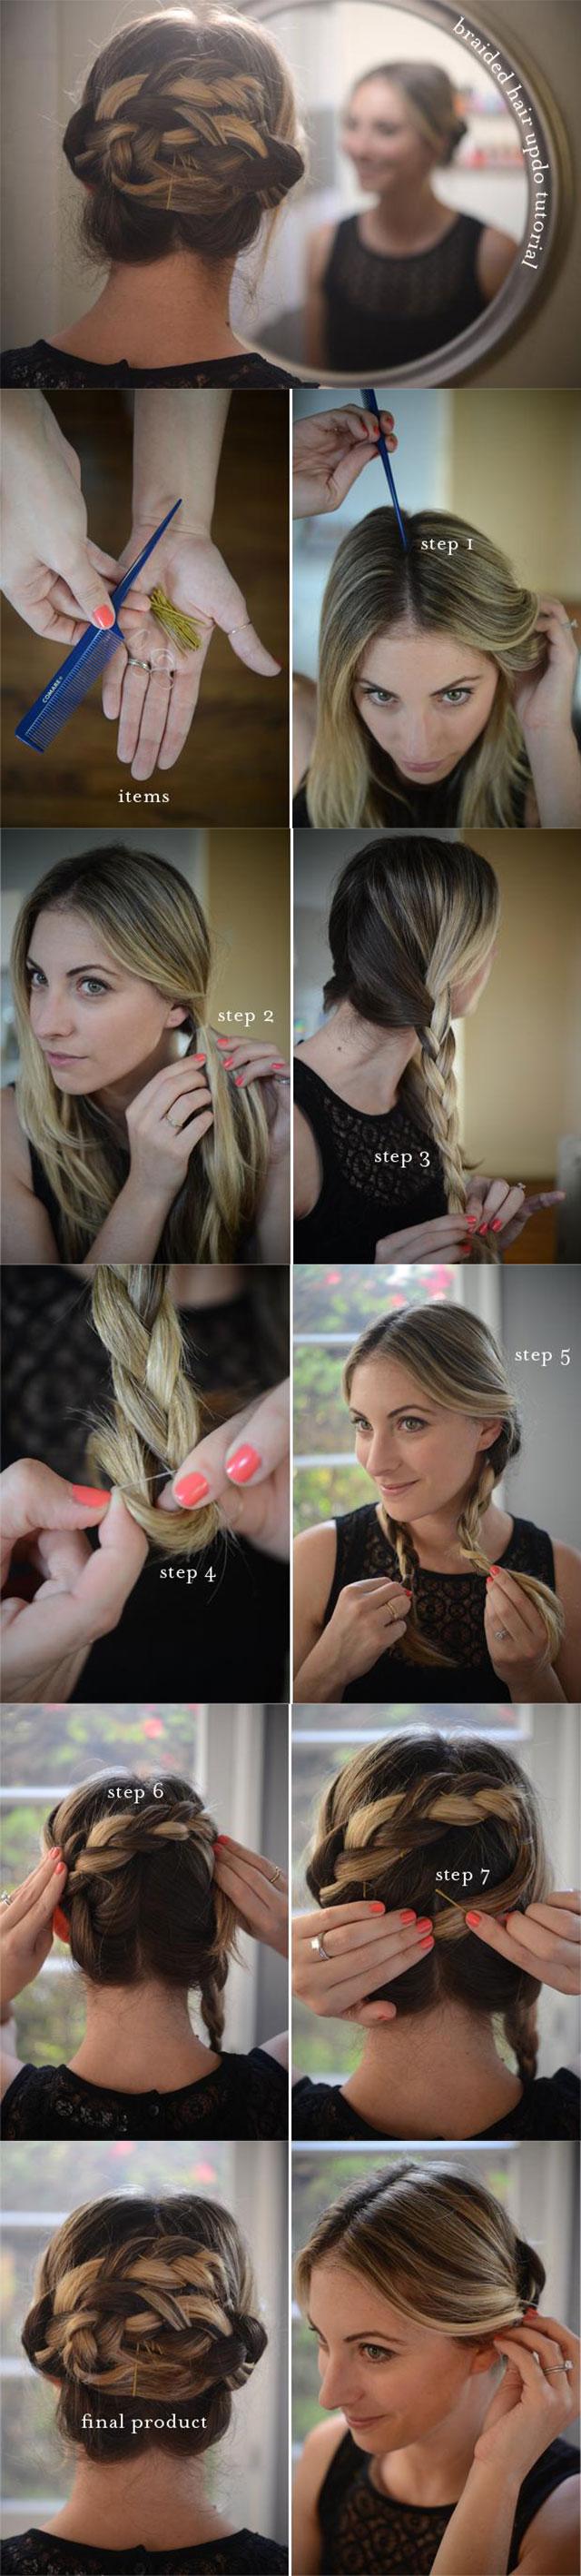 Pretty DIY Hairstyles ...